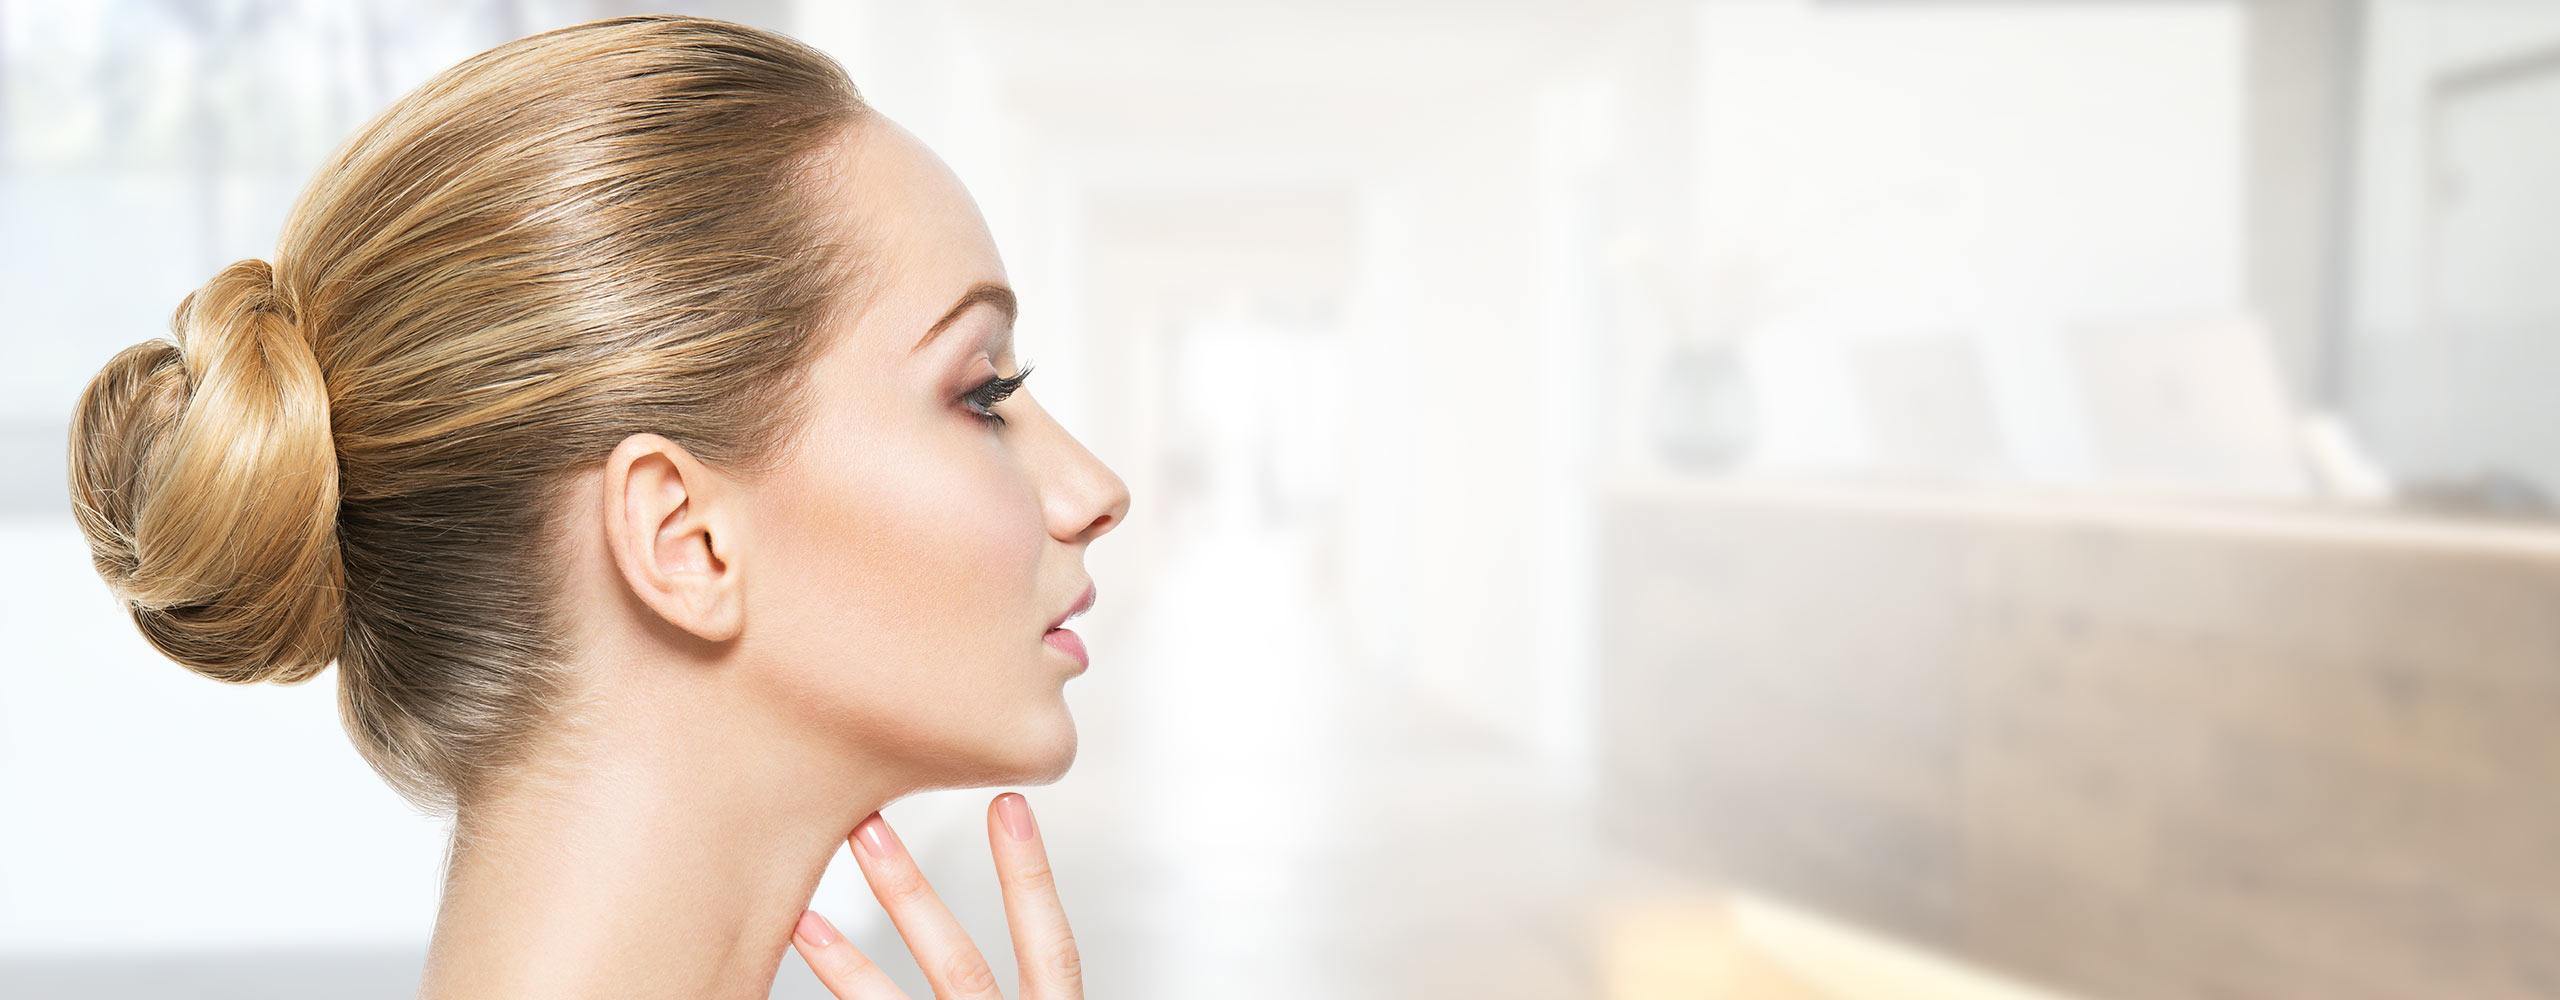 proaesthetic heidelberg schoenheitsklinik nasenkorrektur heidelberg header